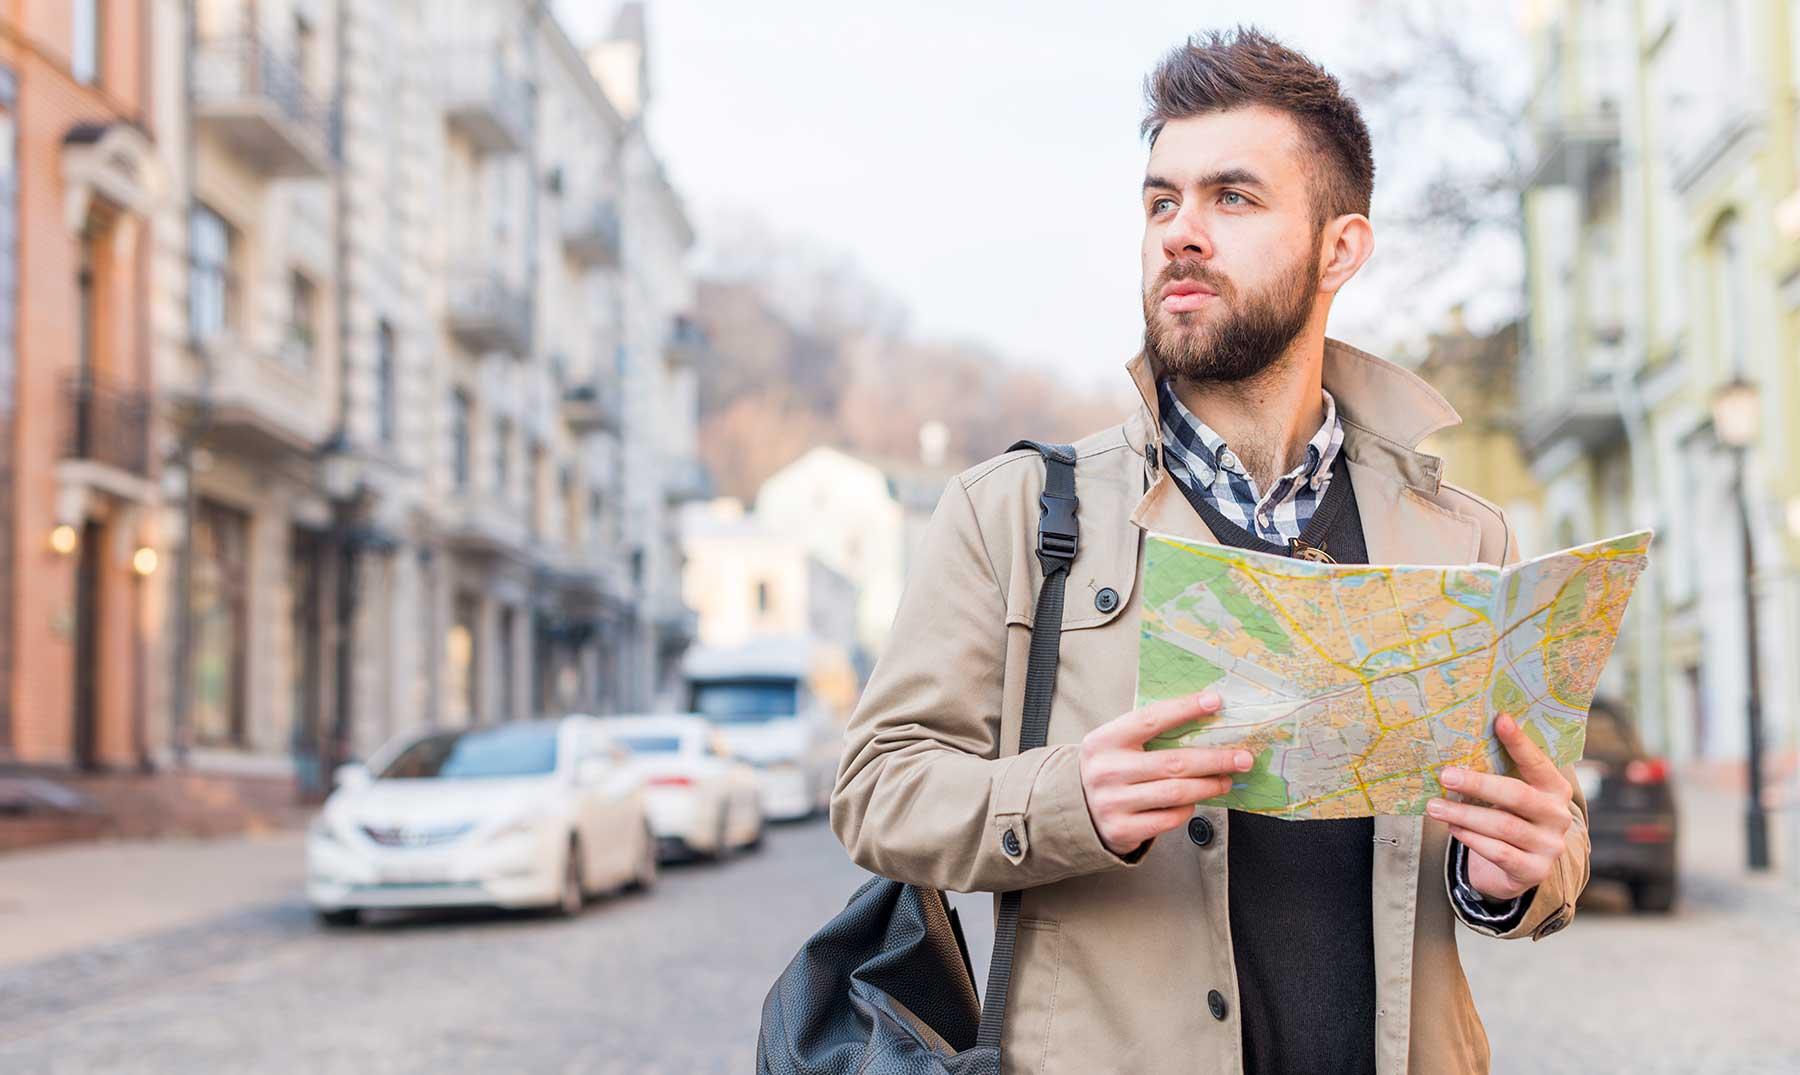 Transporte público Madrid | Muévete como un local